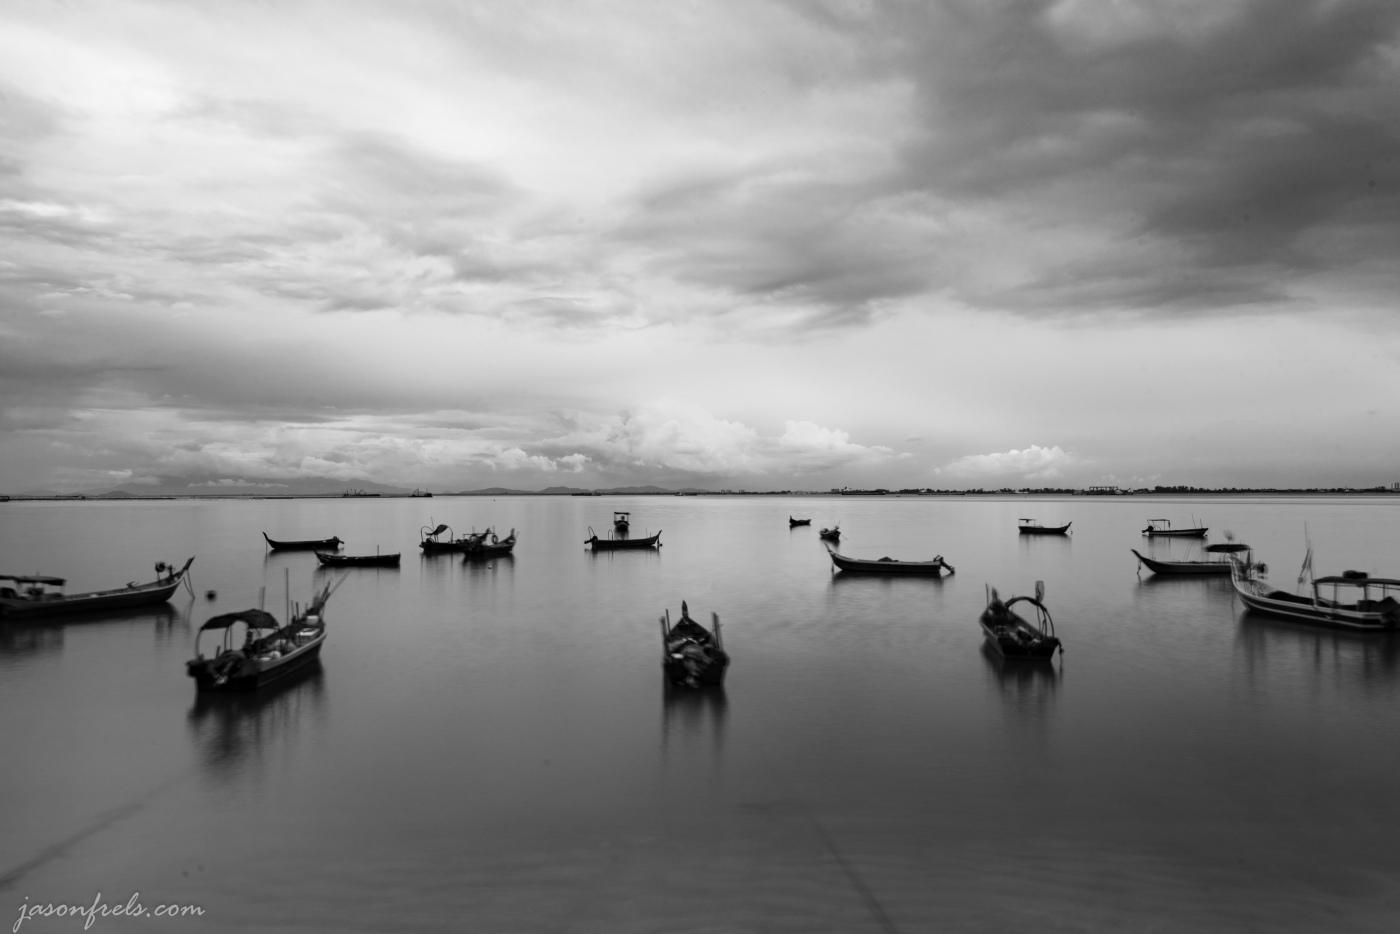 Boats along the shore in Penang Malaysia